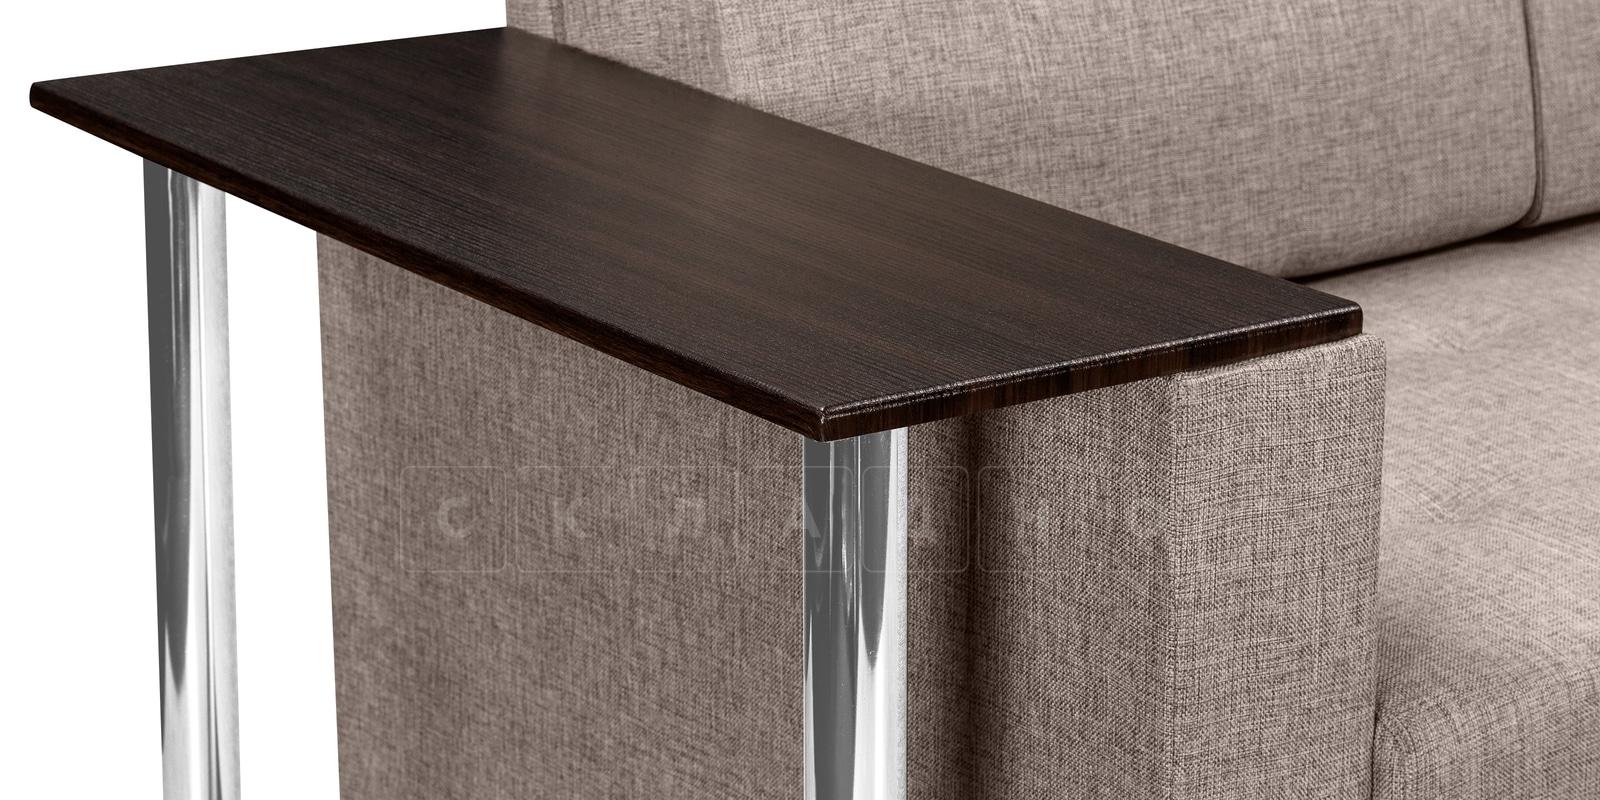 Угловой диван Атланта рогожка темно-бежевого цвета фото 4 | интернет-магазин Складно